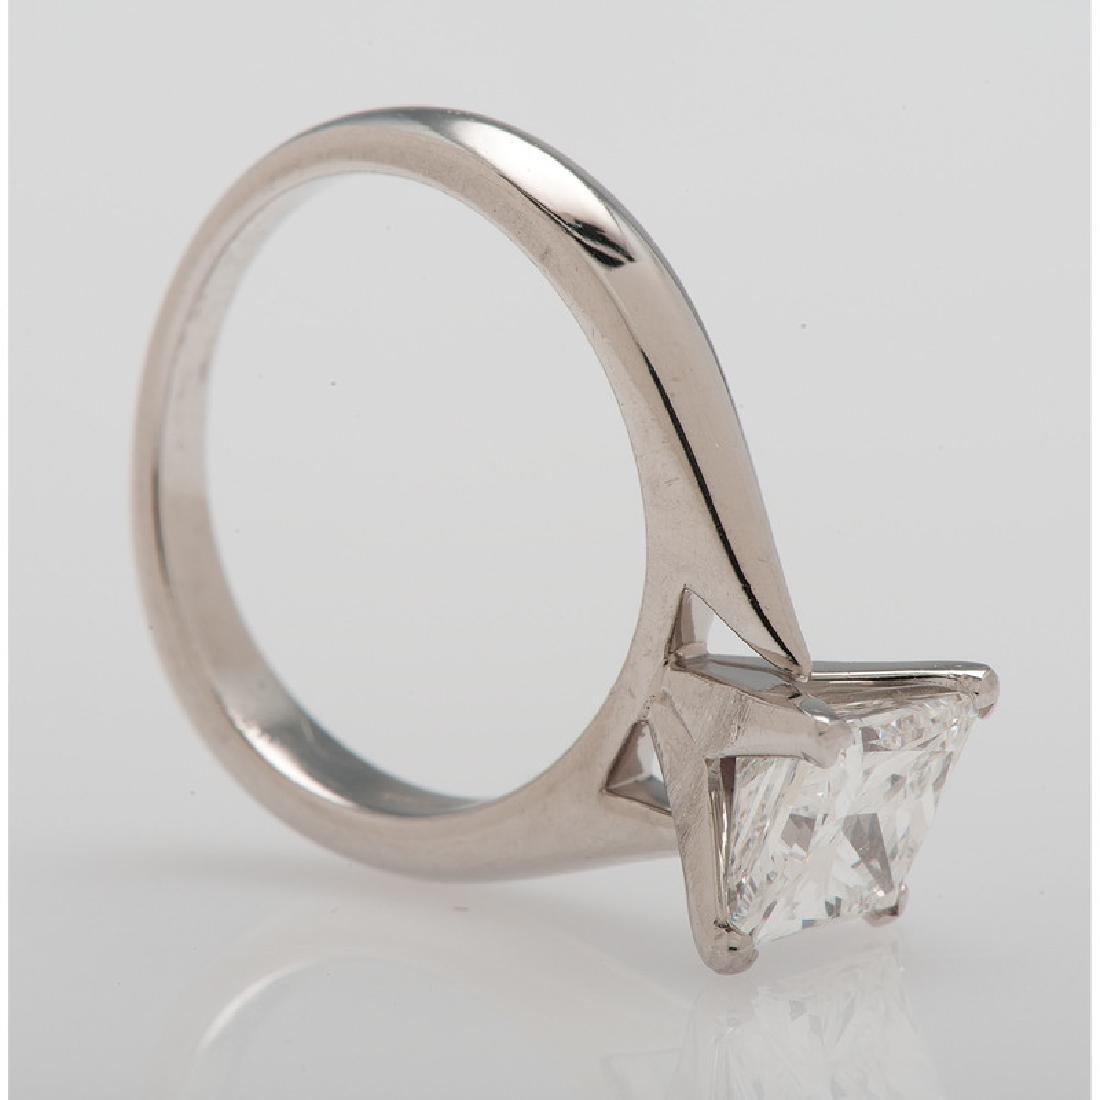 Bailey Banks & Biddle Platinum Diamond Ring - 4